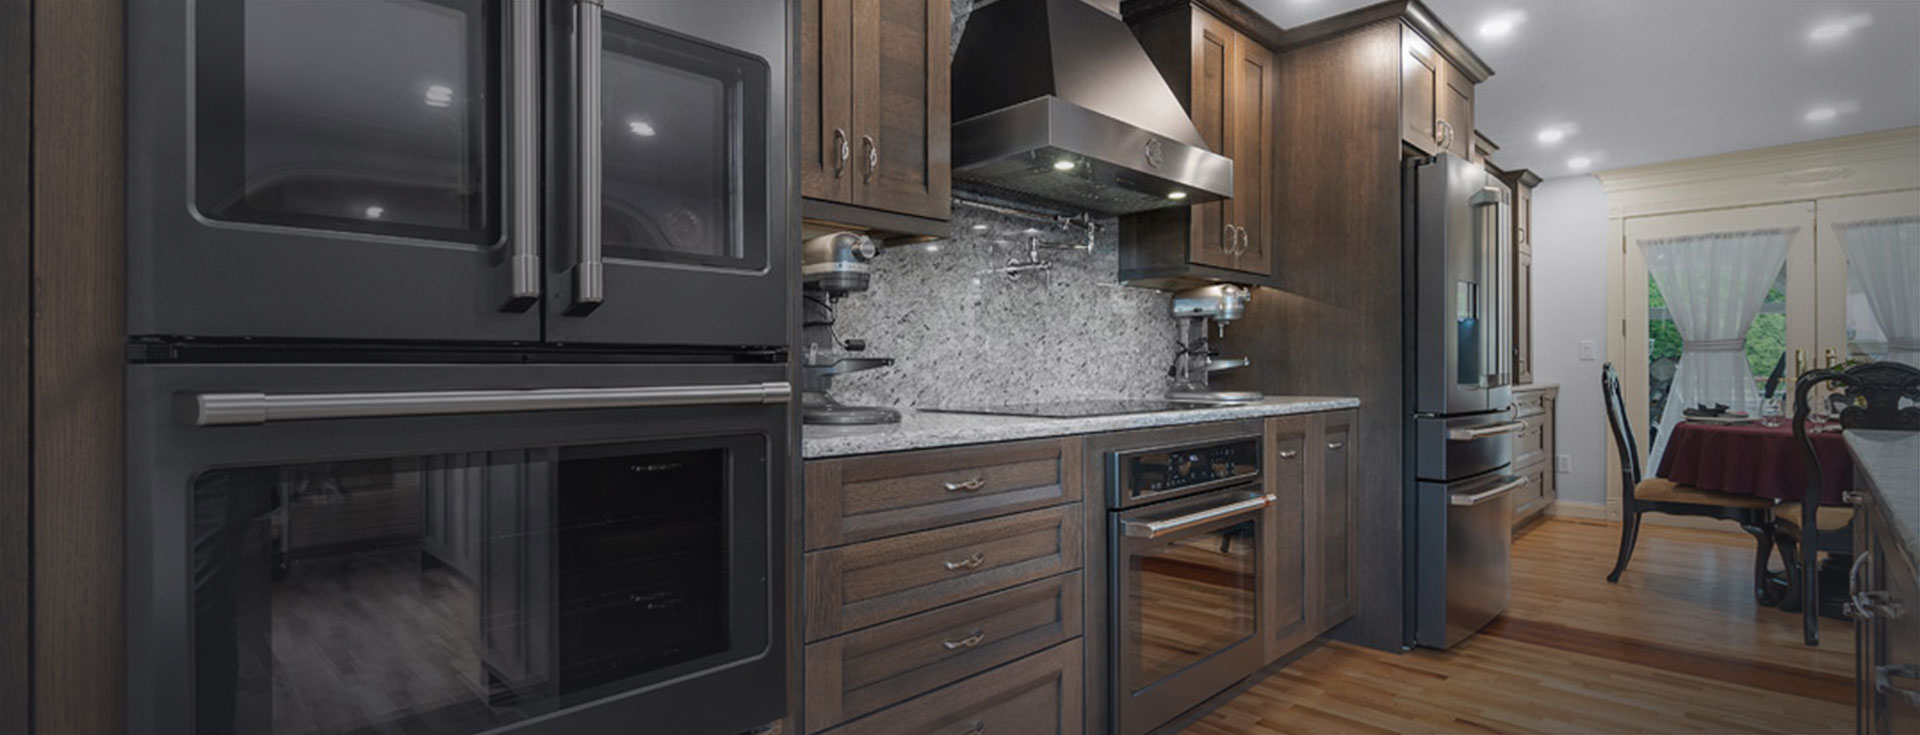 Richardson Kitchen Remodel Hero - Cabinets by Trivonna